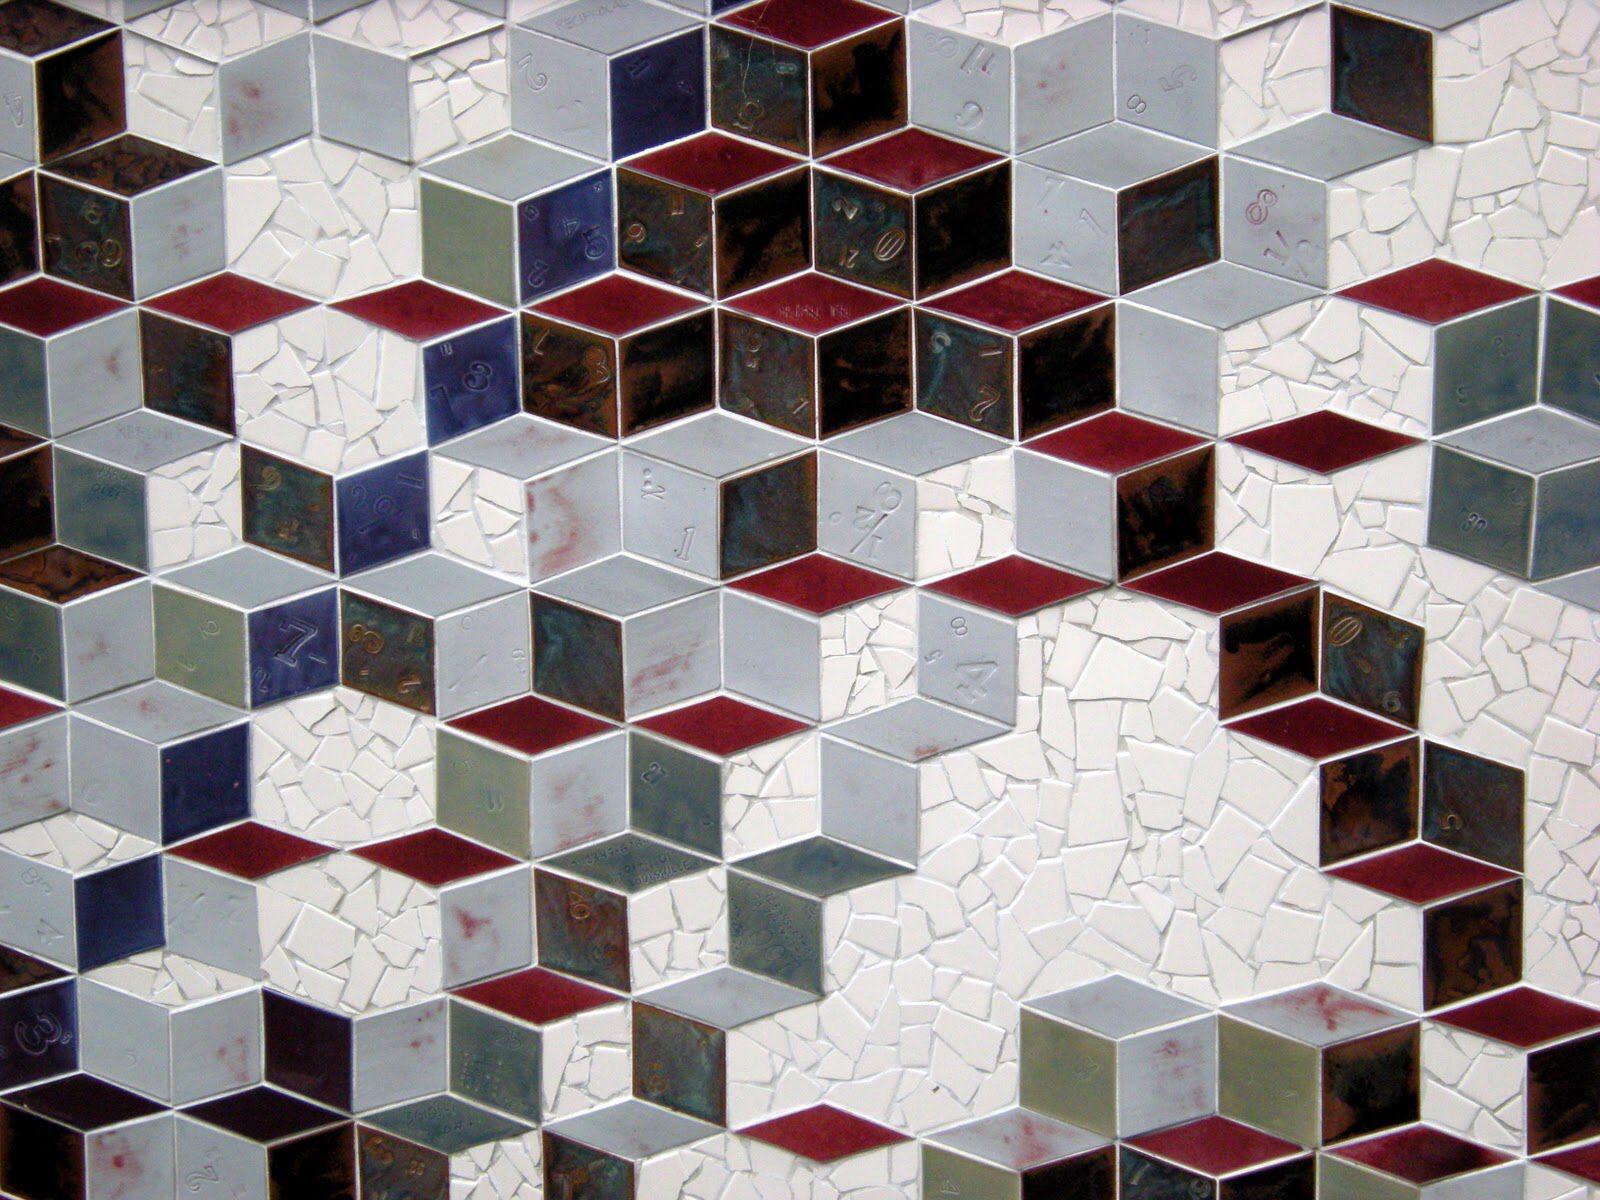 Tessellation Tango Wall Mural Mathematical Sciences Research Institute Berkeley Ca Mosaic Tile Designs Family Sculpture Mosaic